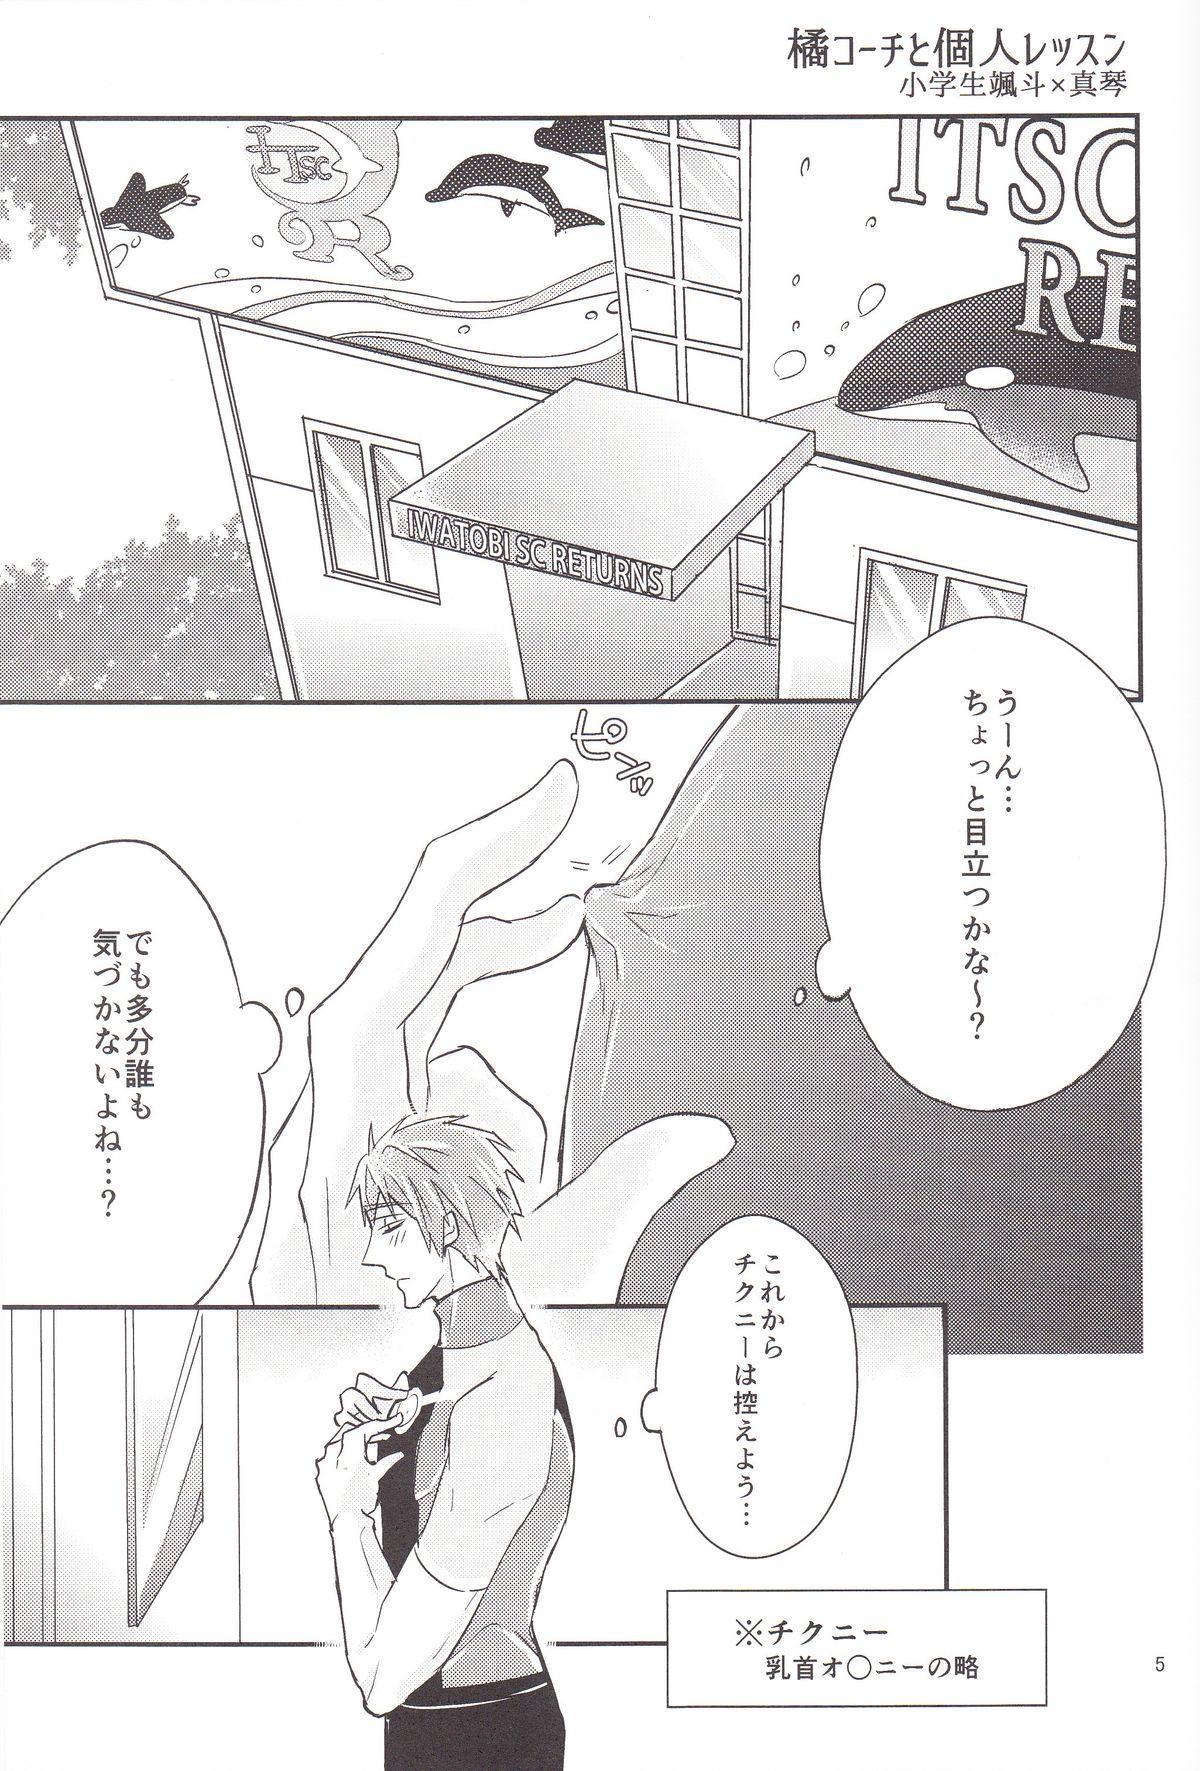 Tachibana Coach no Kojin Lesson 3